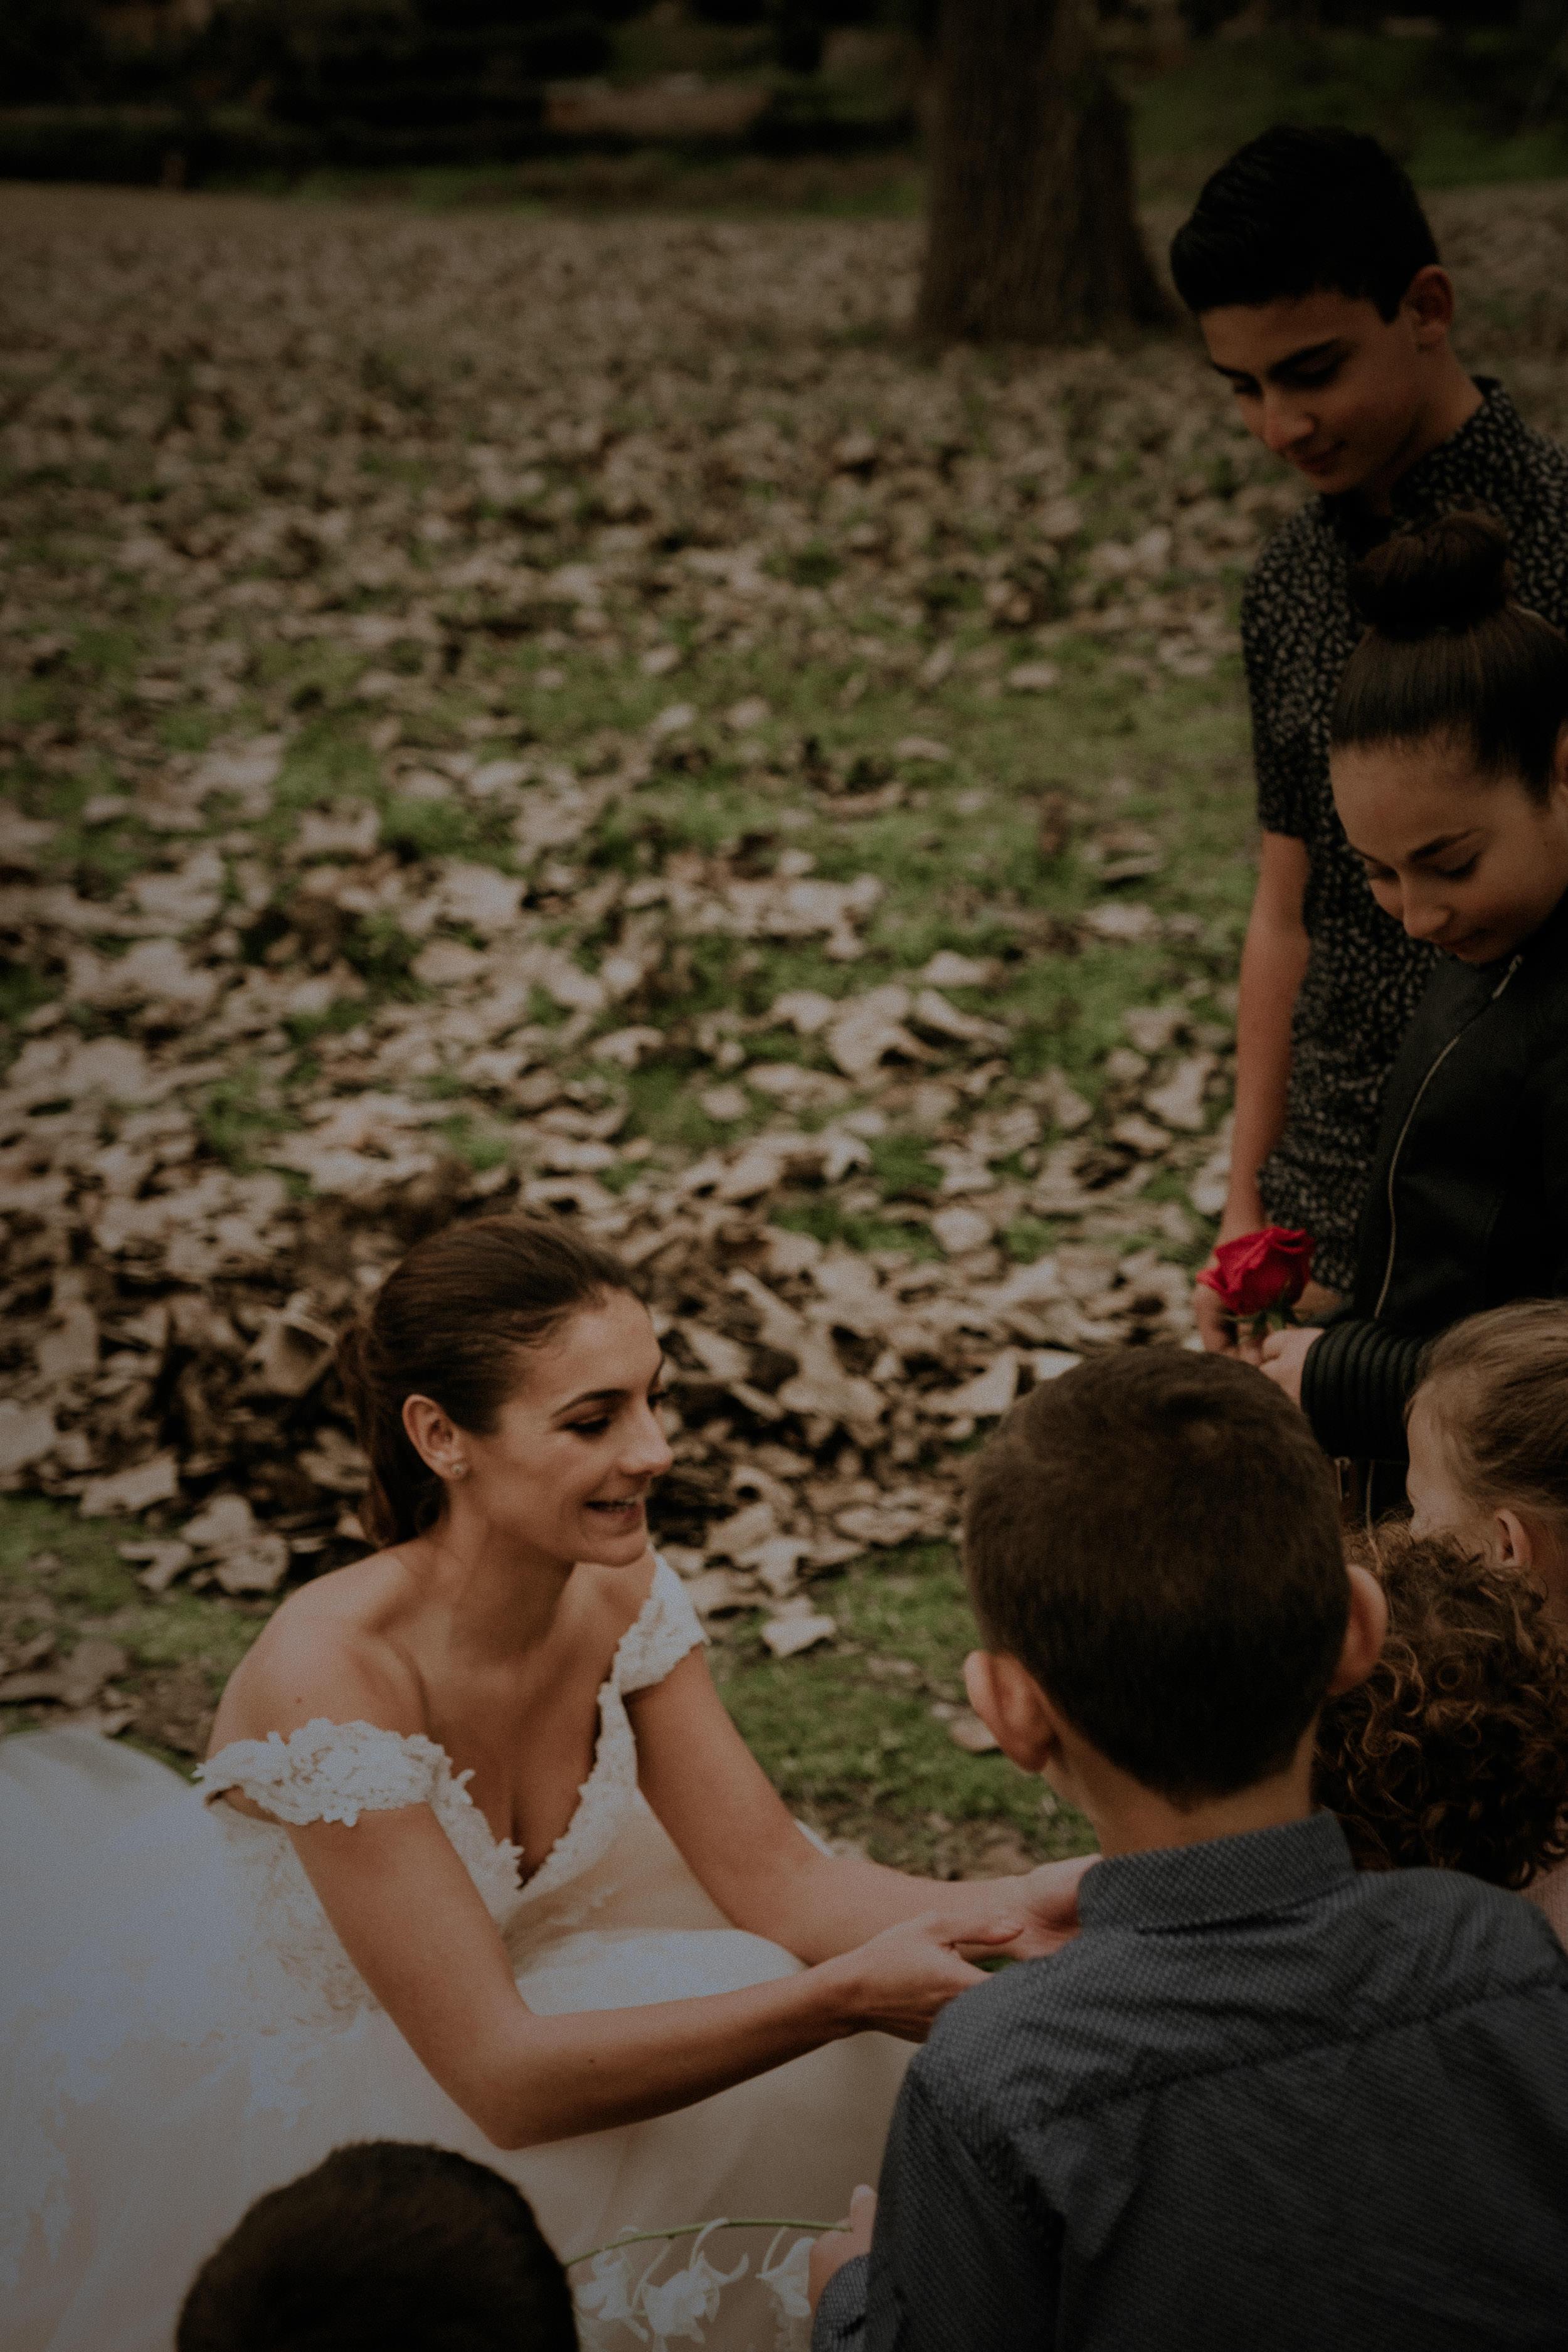 g_c wedding - kings _ thieves elopement wedding photography - blog 18.jpg